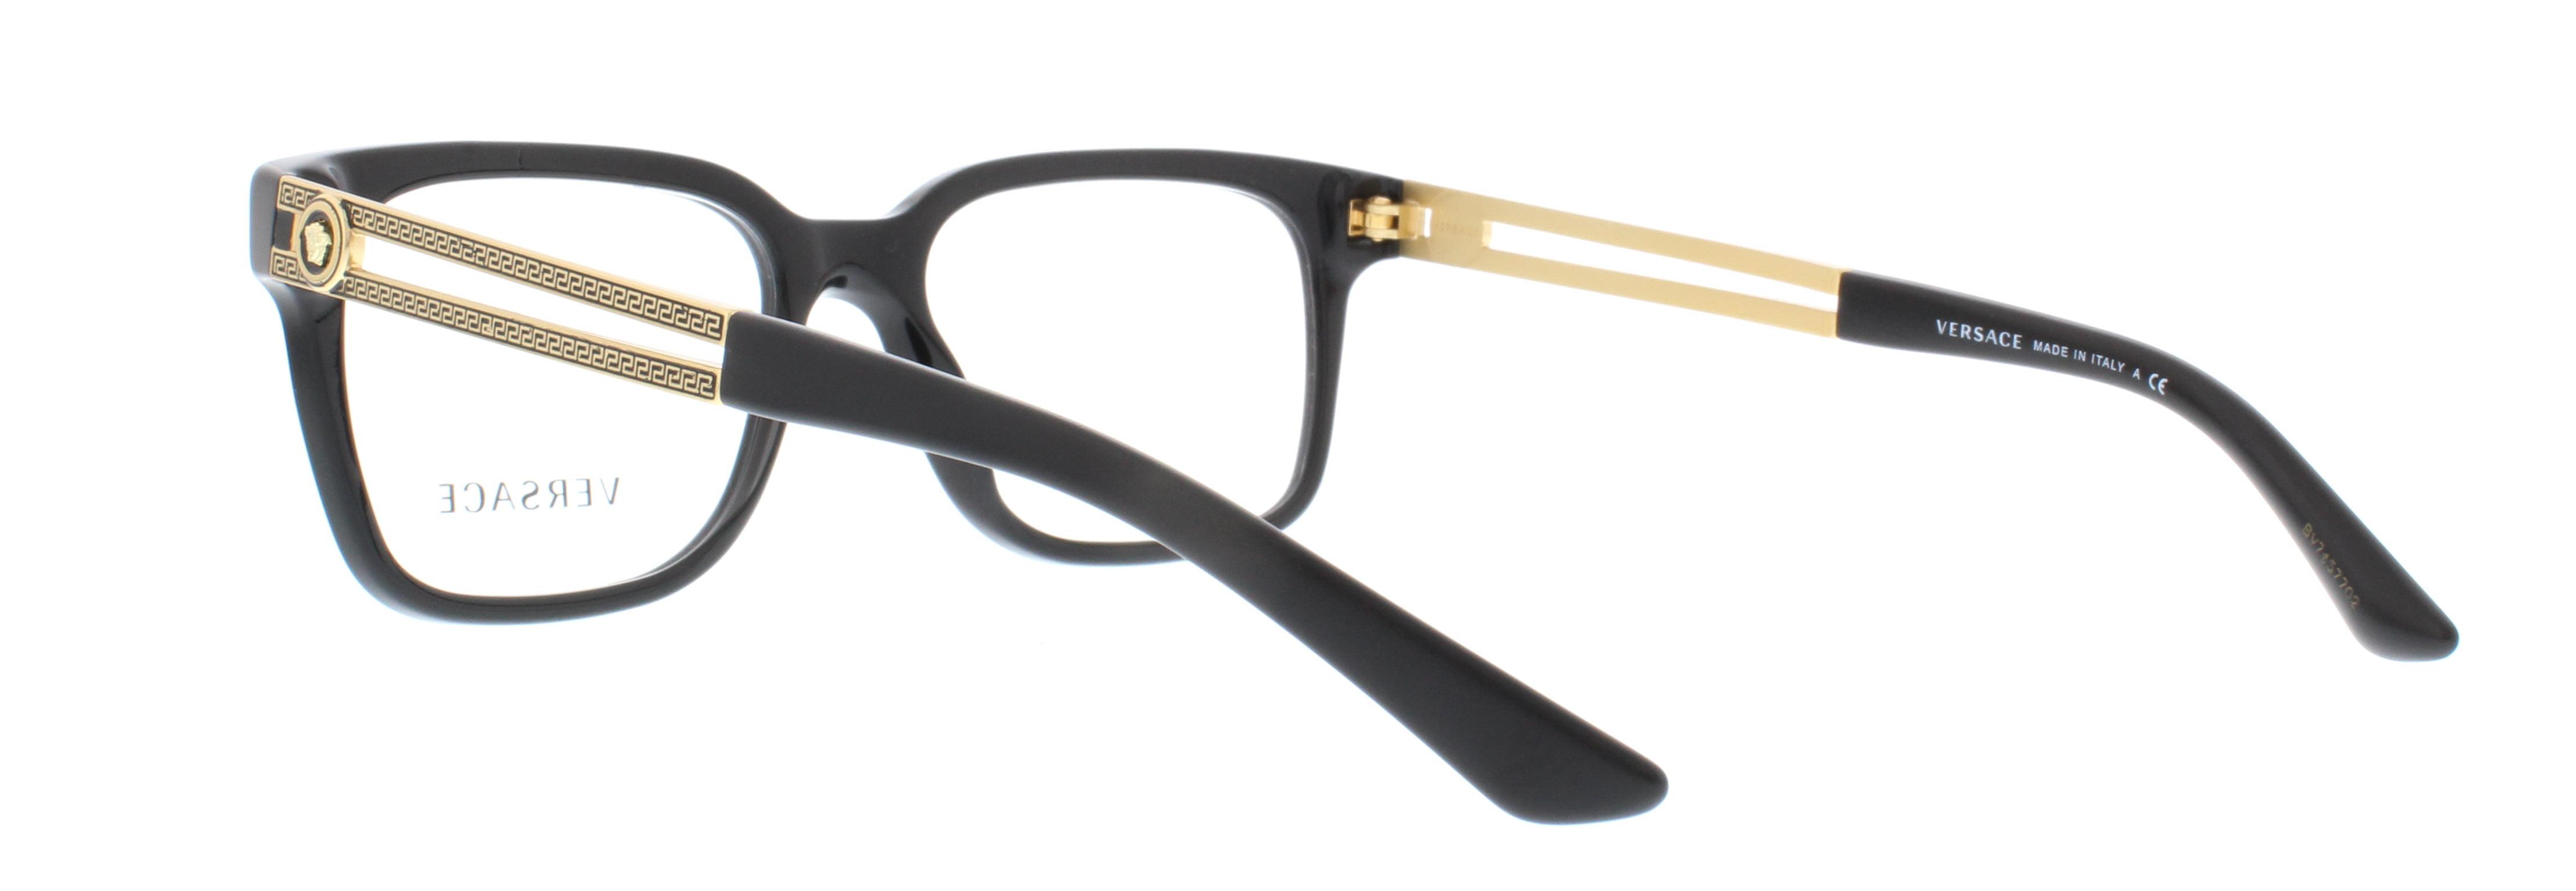 Frame glasses versace - Frame Glasses Versace 79